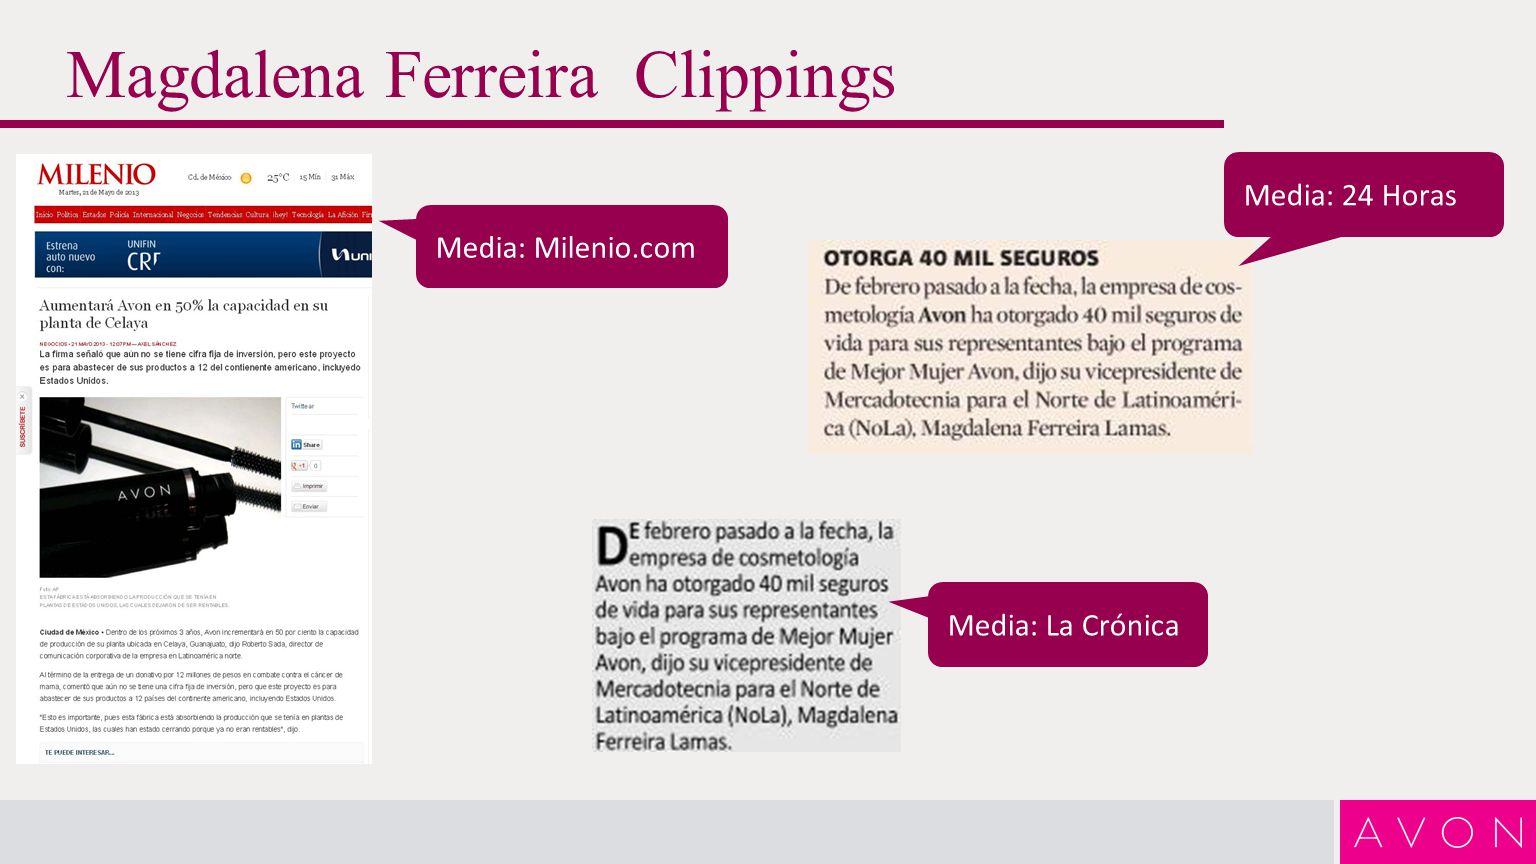 Magdalena Ferreira Clippings Media: Financiero.com Media: NOTIMEX